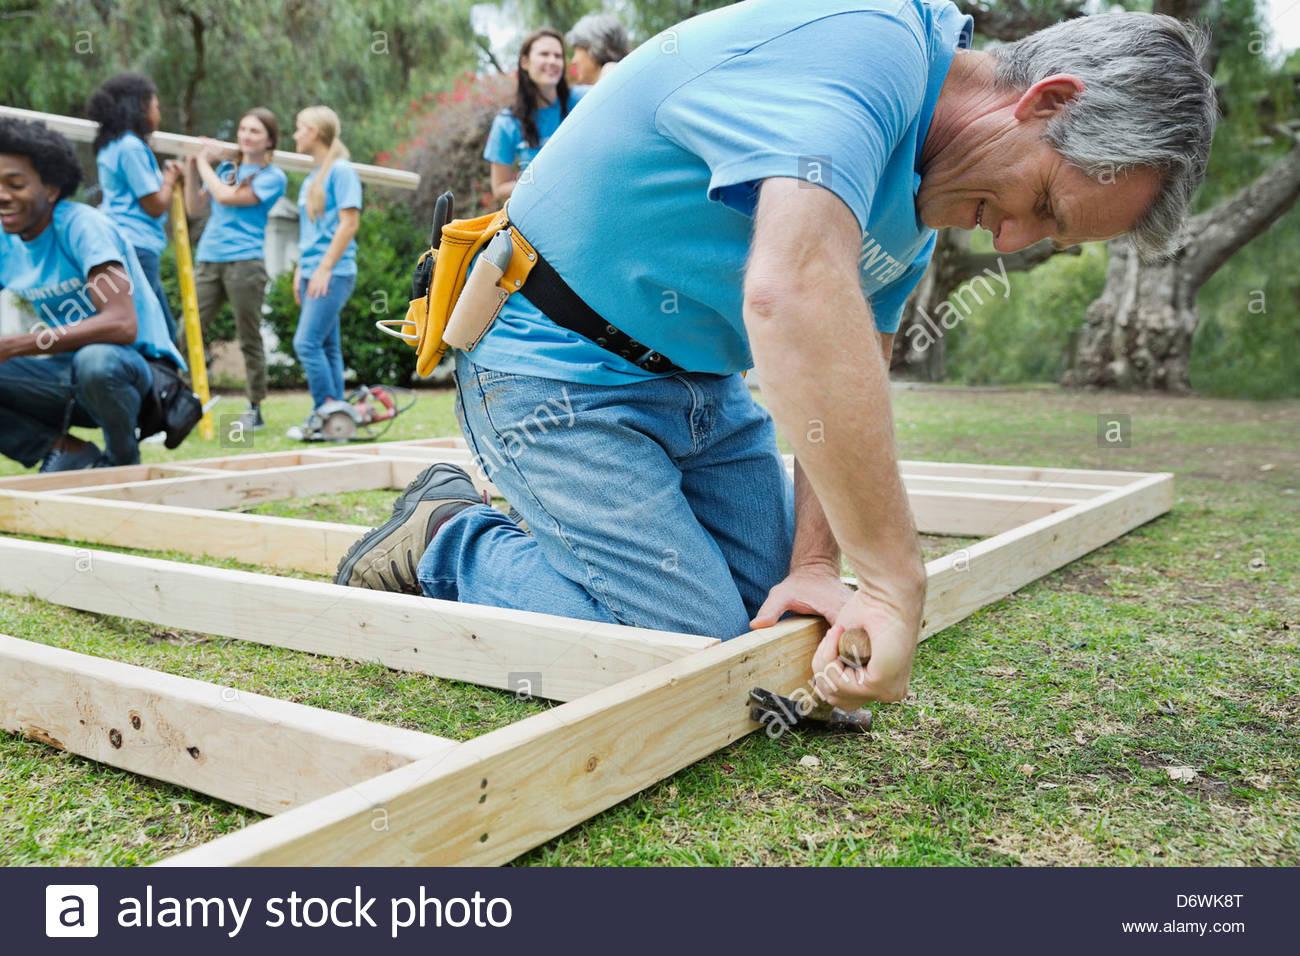 Man Hammer Wood Nail Plank Stock Photos & Man Hammer Wood Nail Plank ...